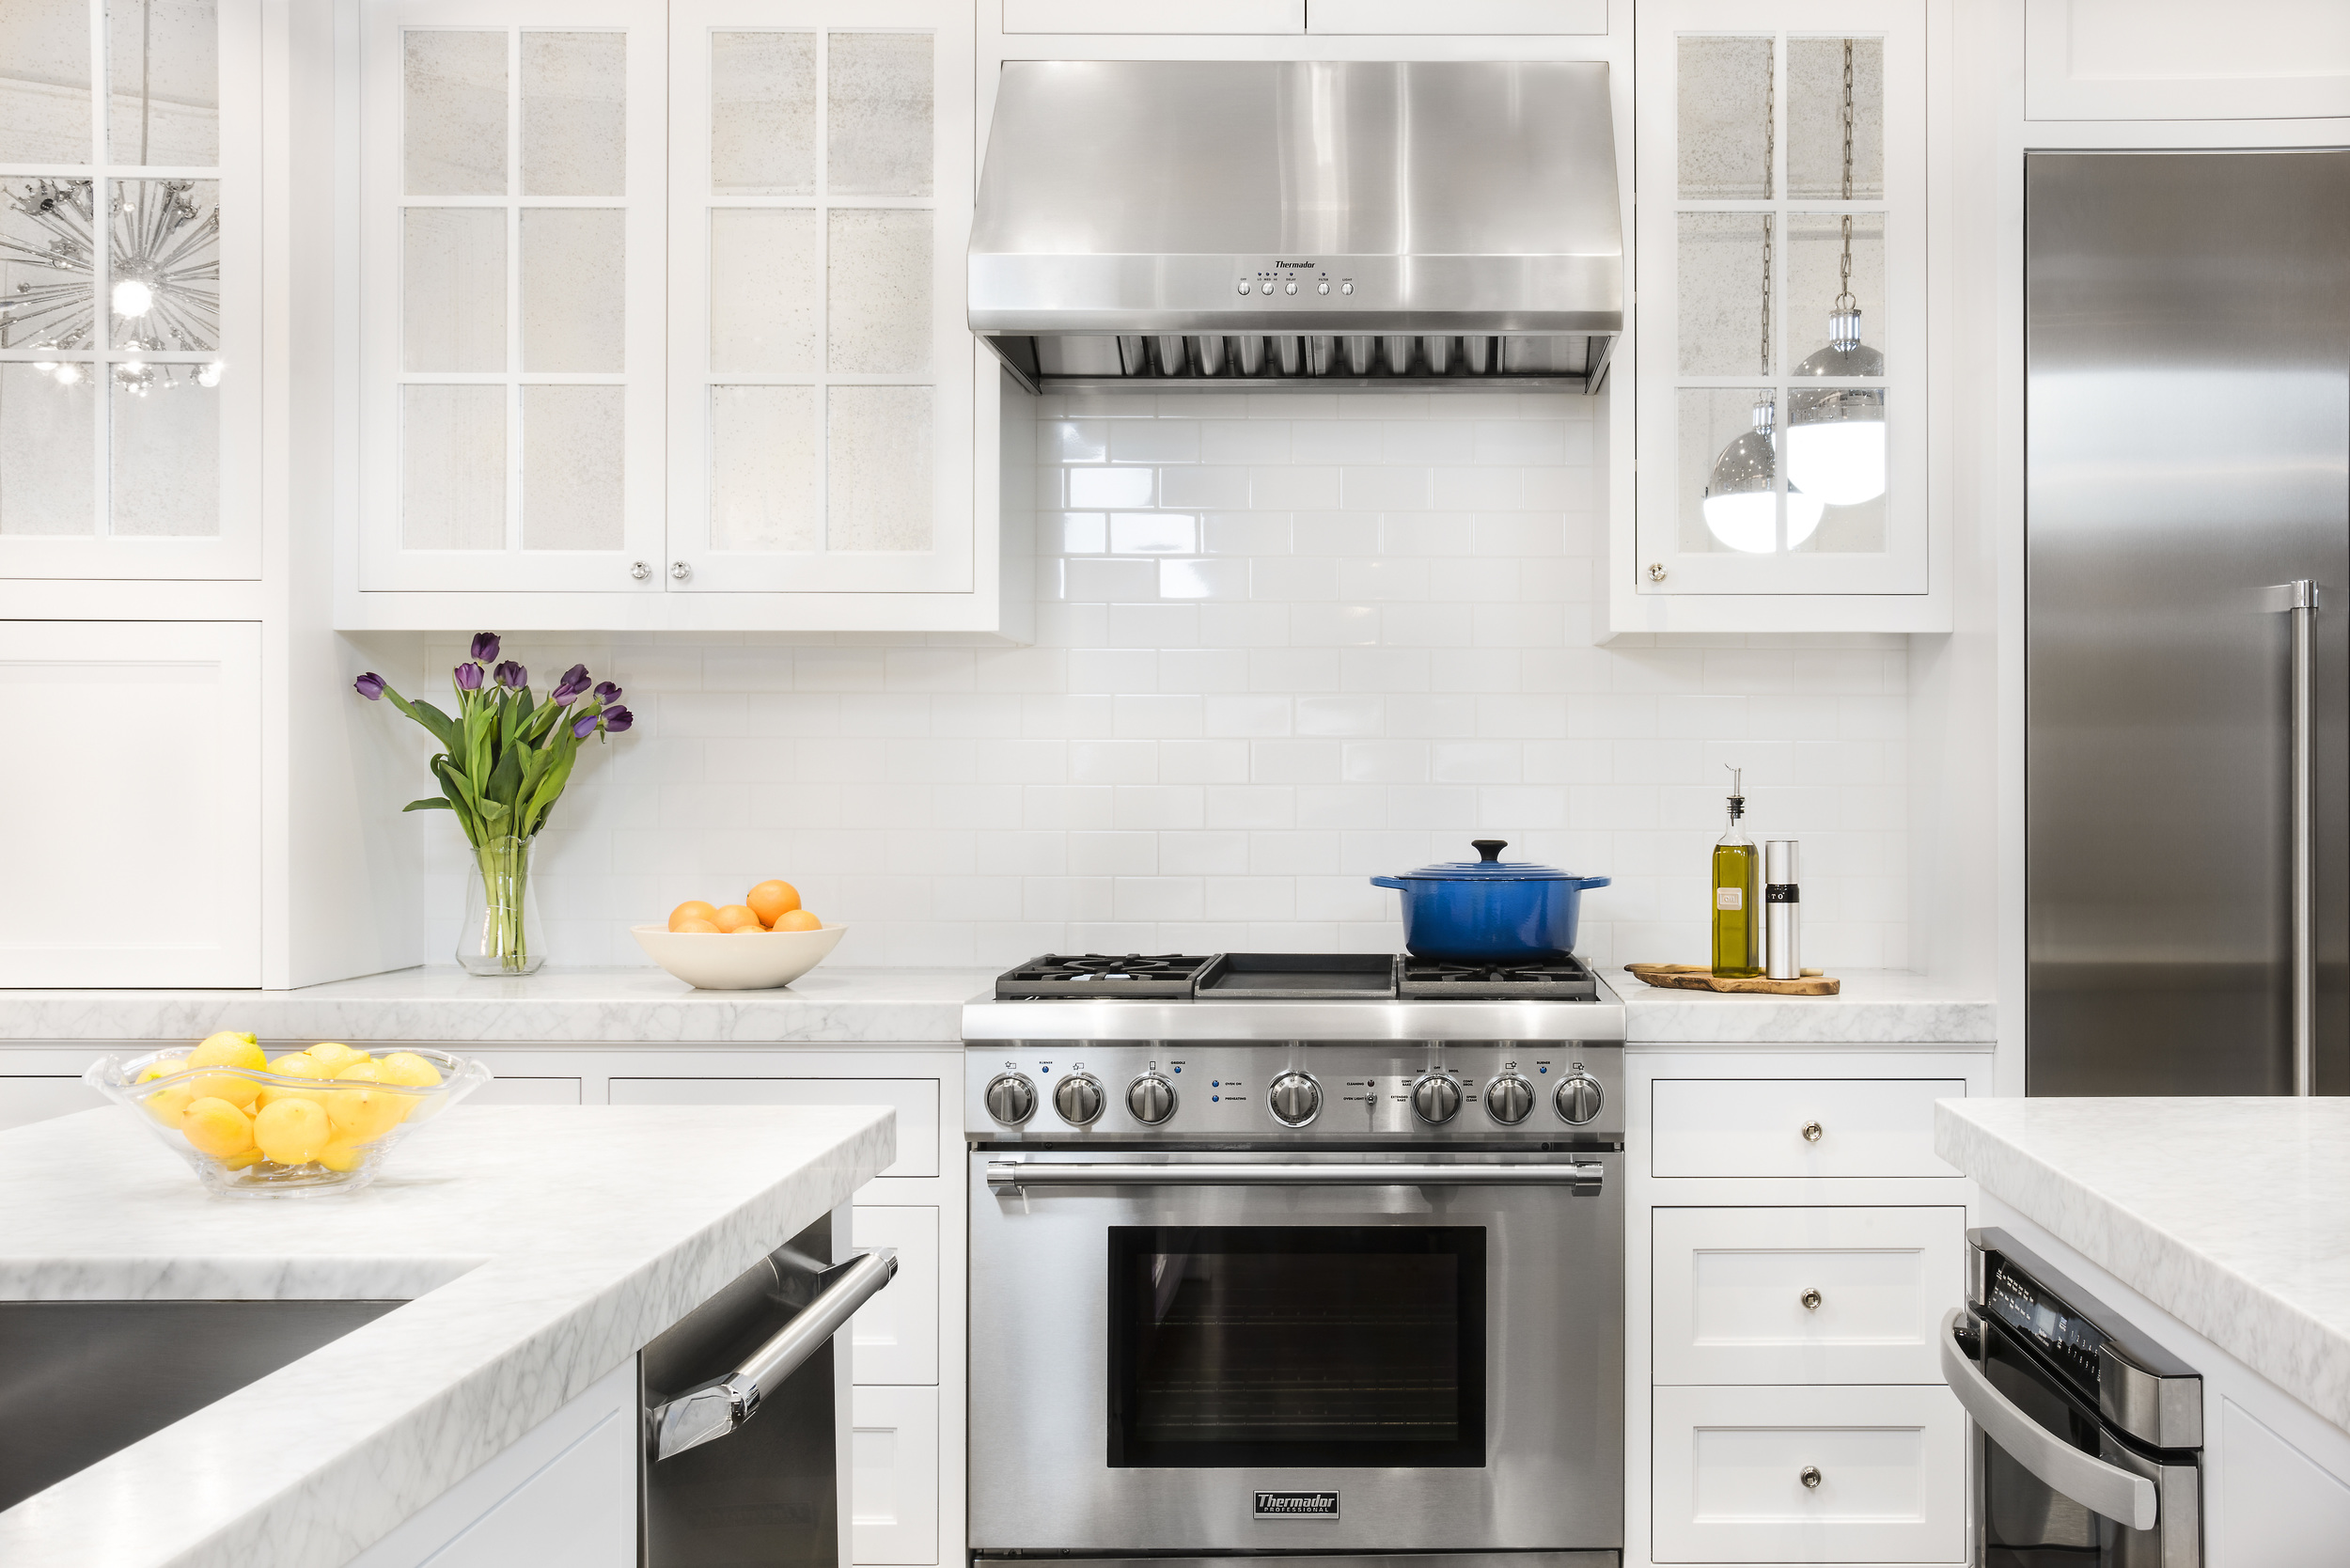 kitchenexeterfinalprinted copy.jpg